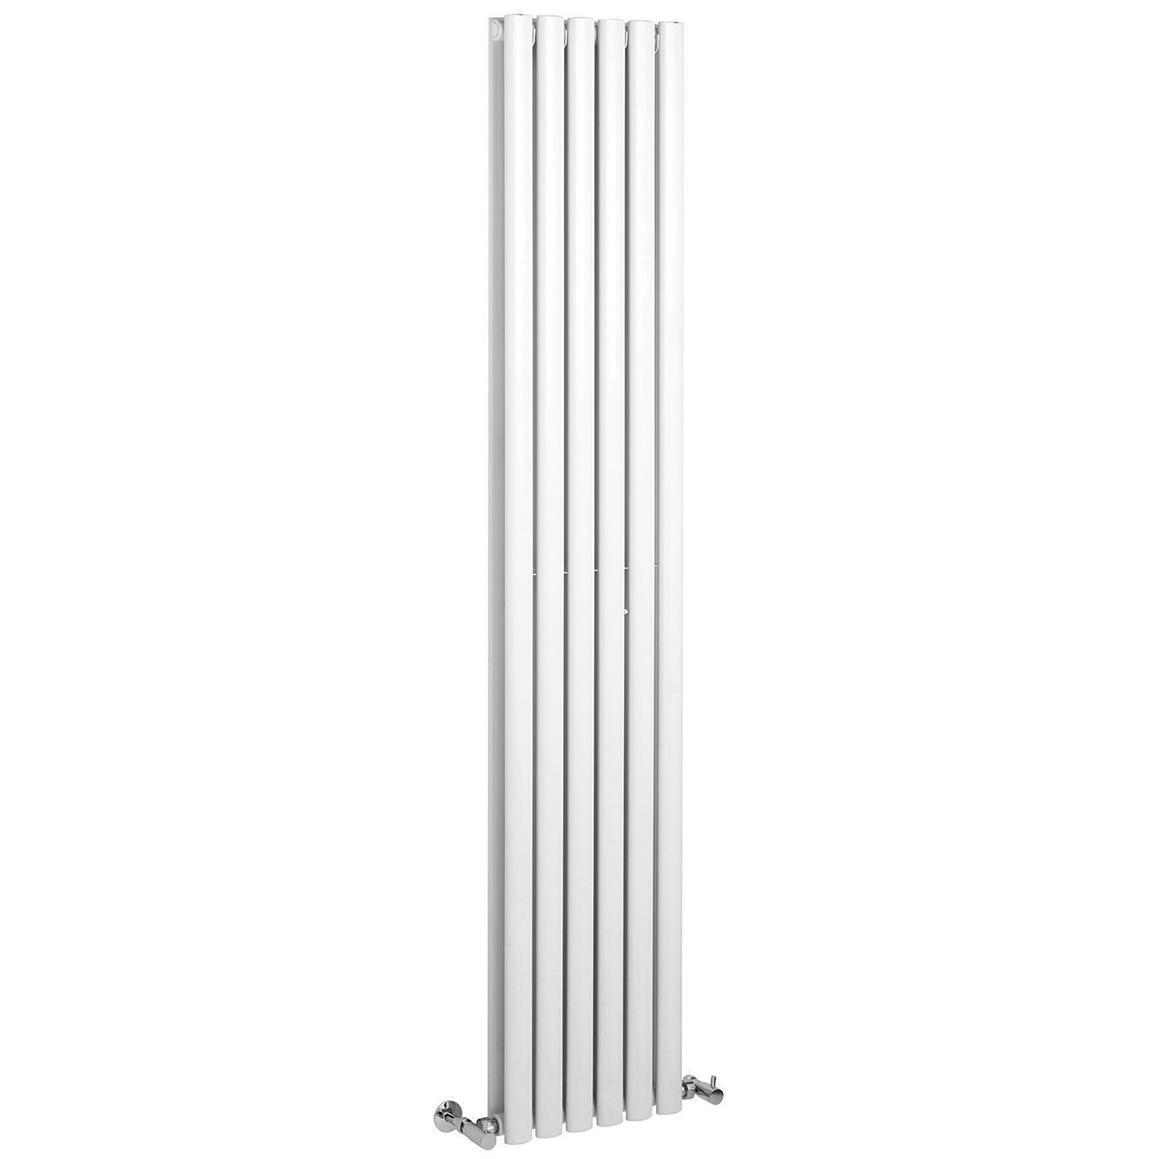 beo retro 326 354 x 1800mm vertical designer radiator high gloss white. Black Bedroom Furniture Sets. Home Design Ideas